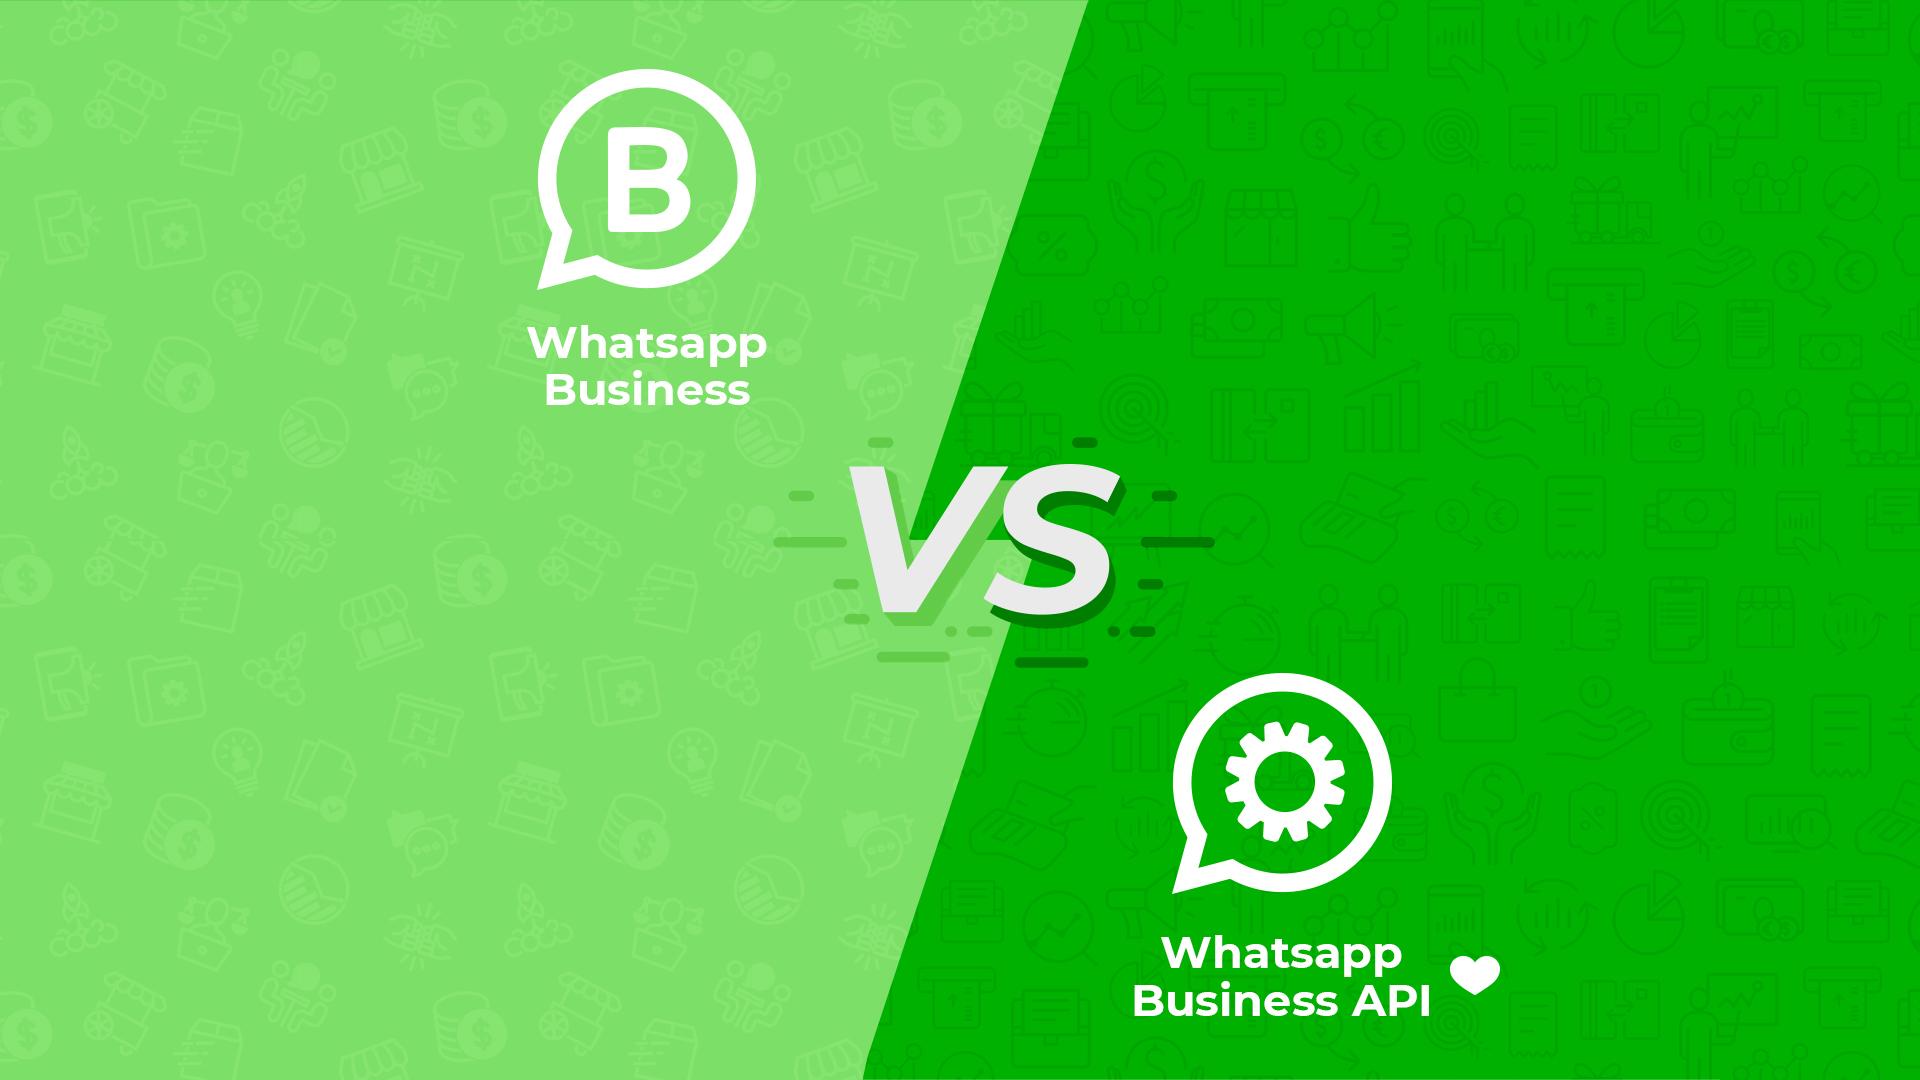 WhatsApp Business App vs WhatsApp Business API